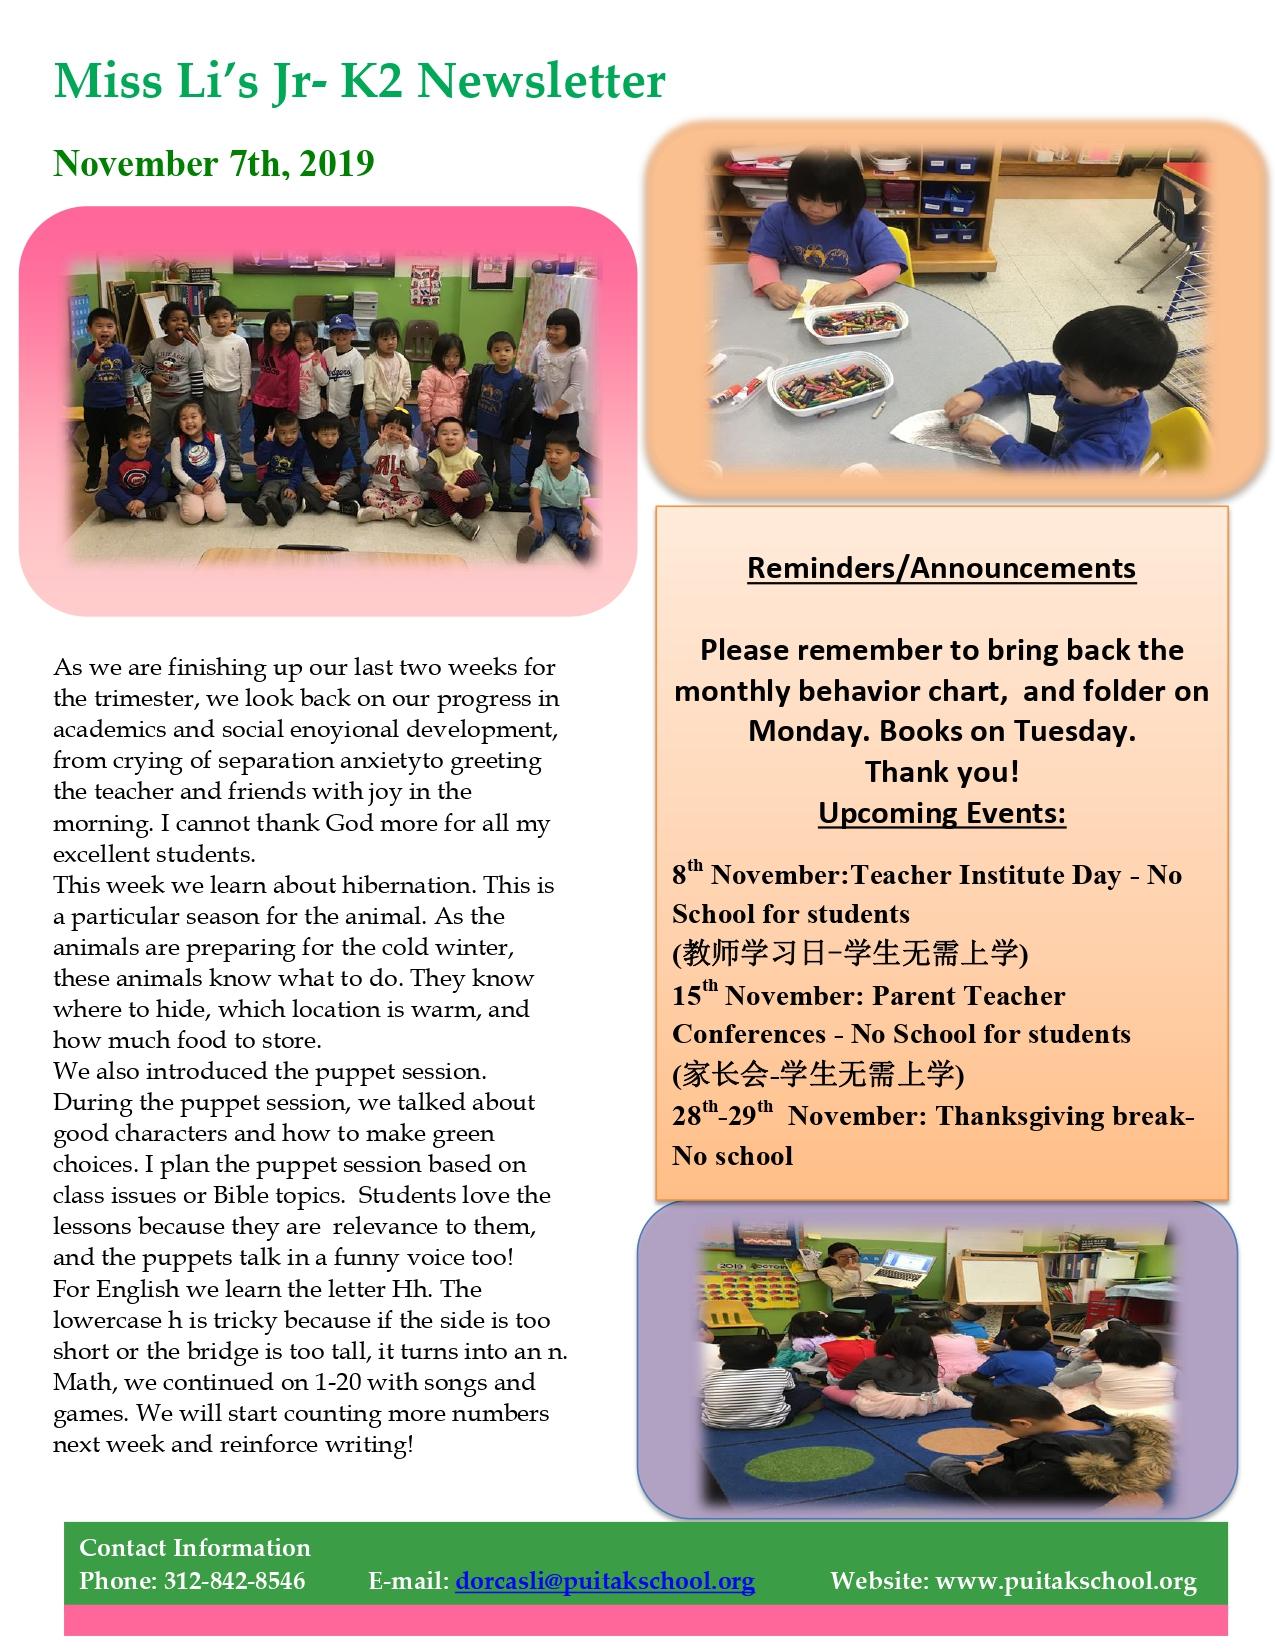 DorcasNewsletter2019November1stWeek_page